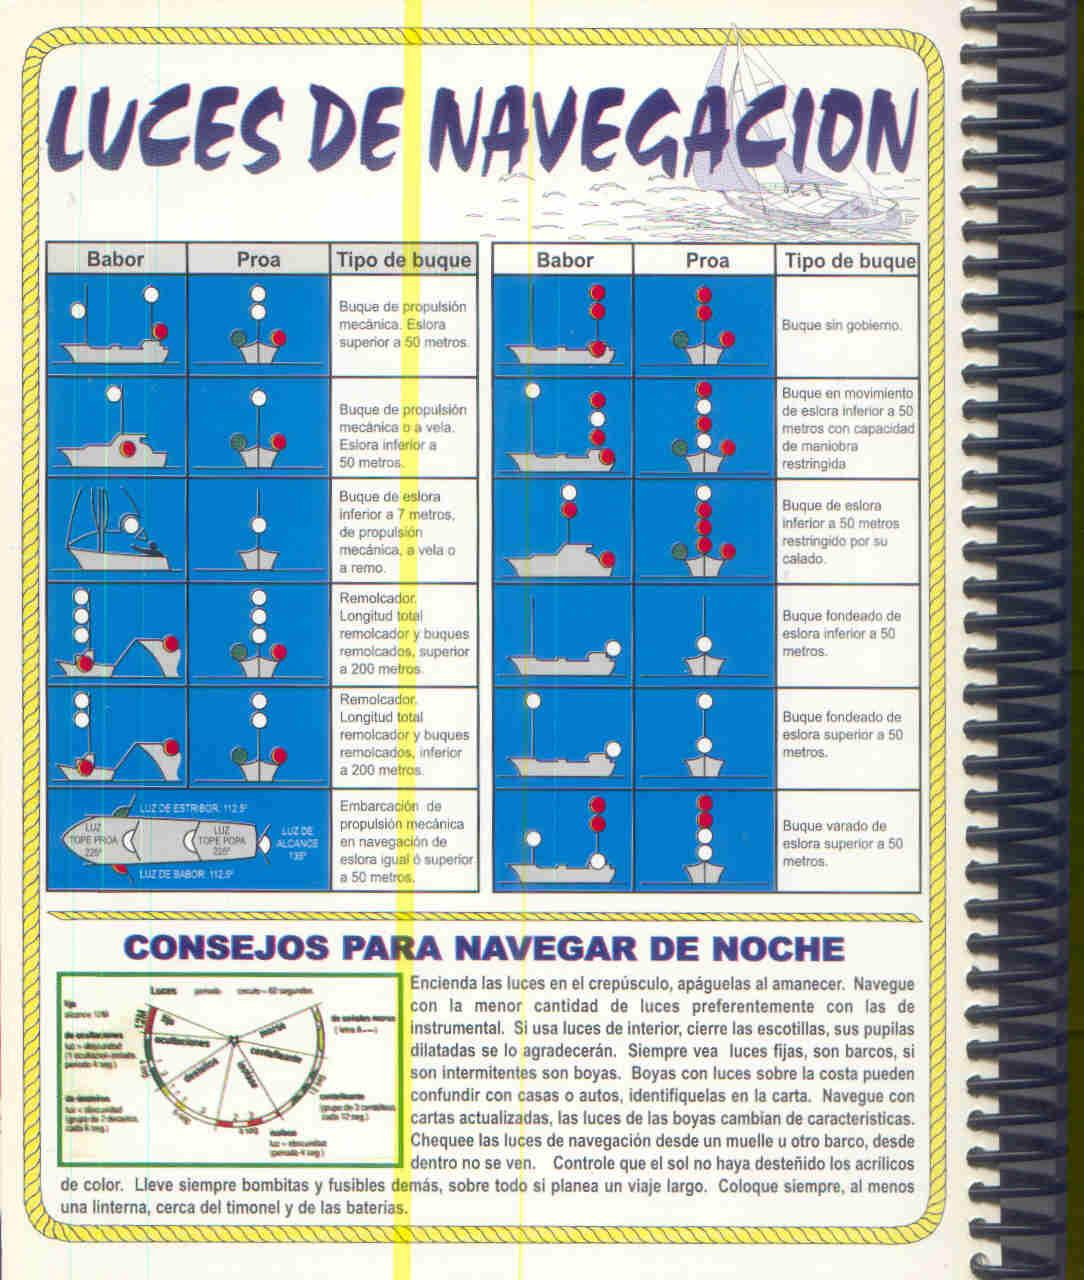 luces de navegacion: